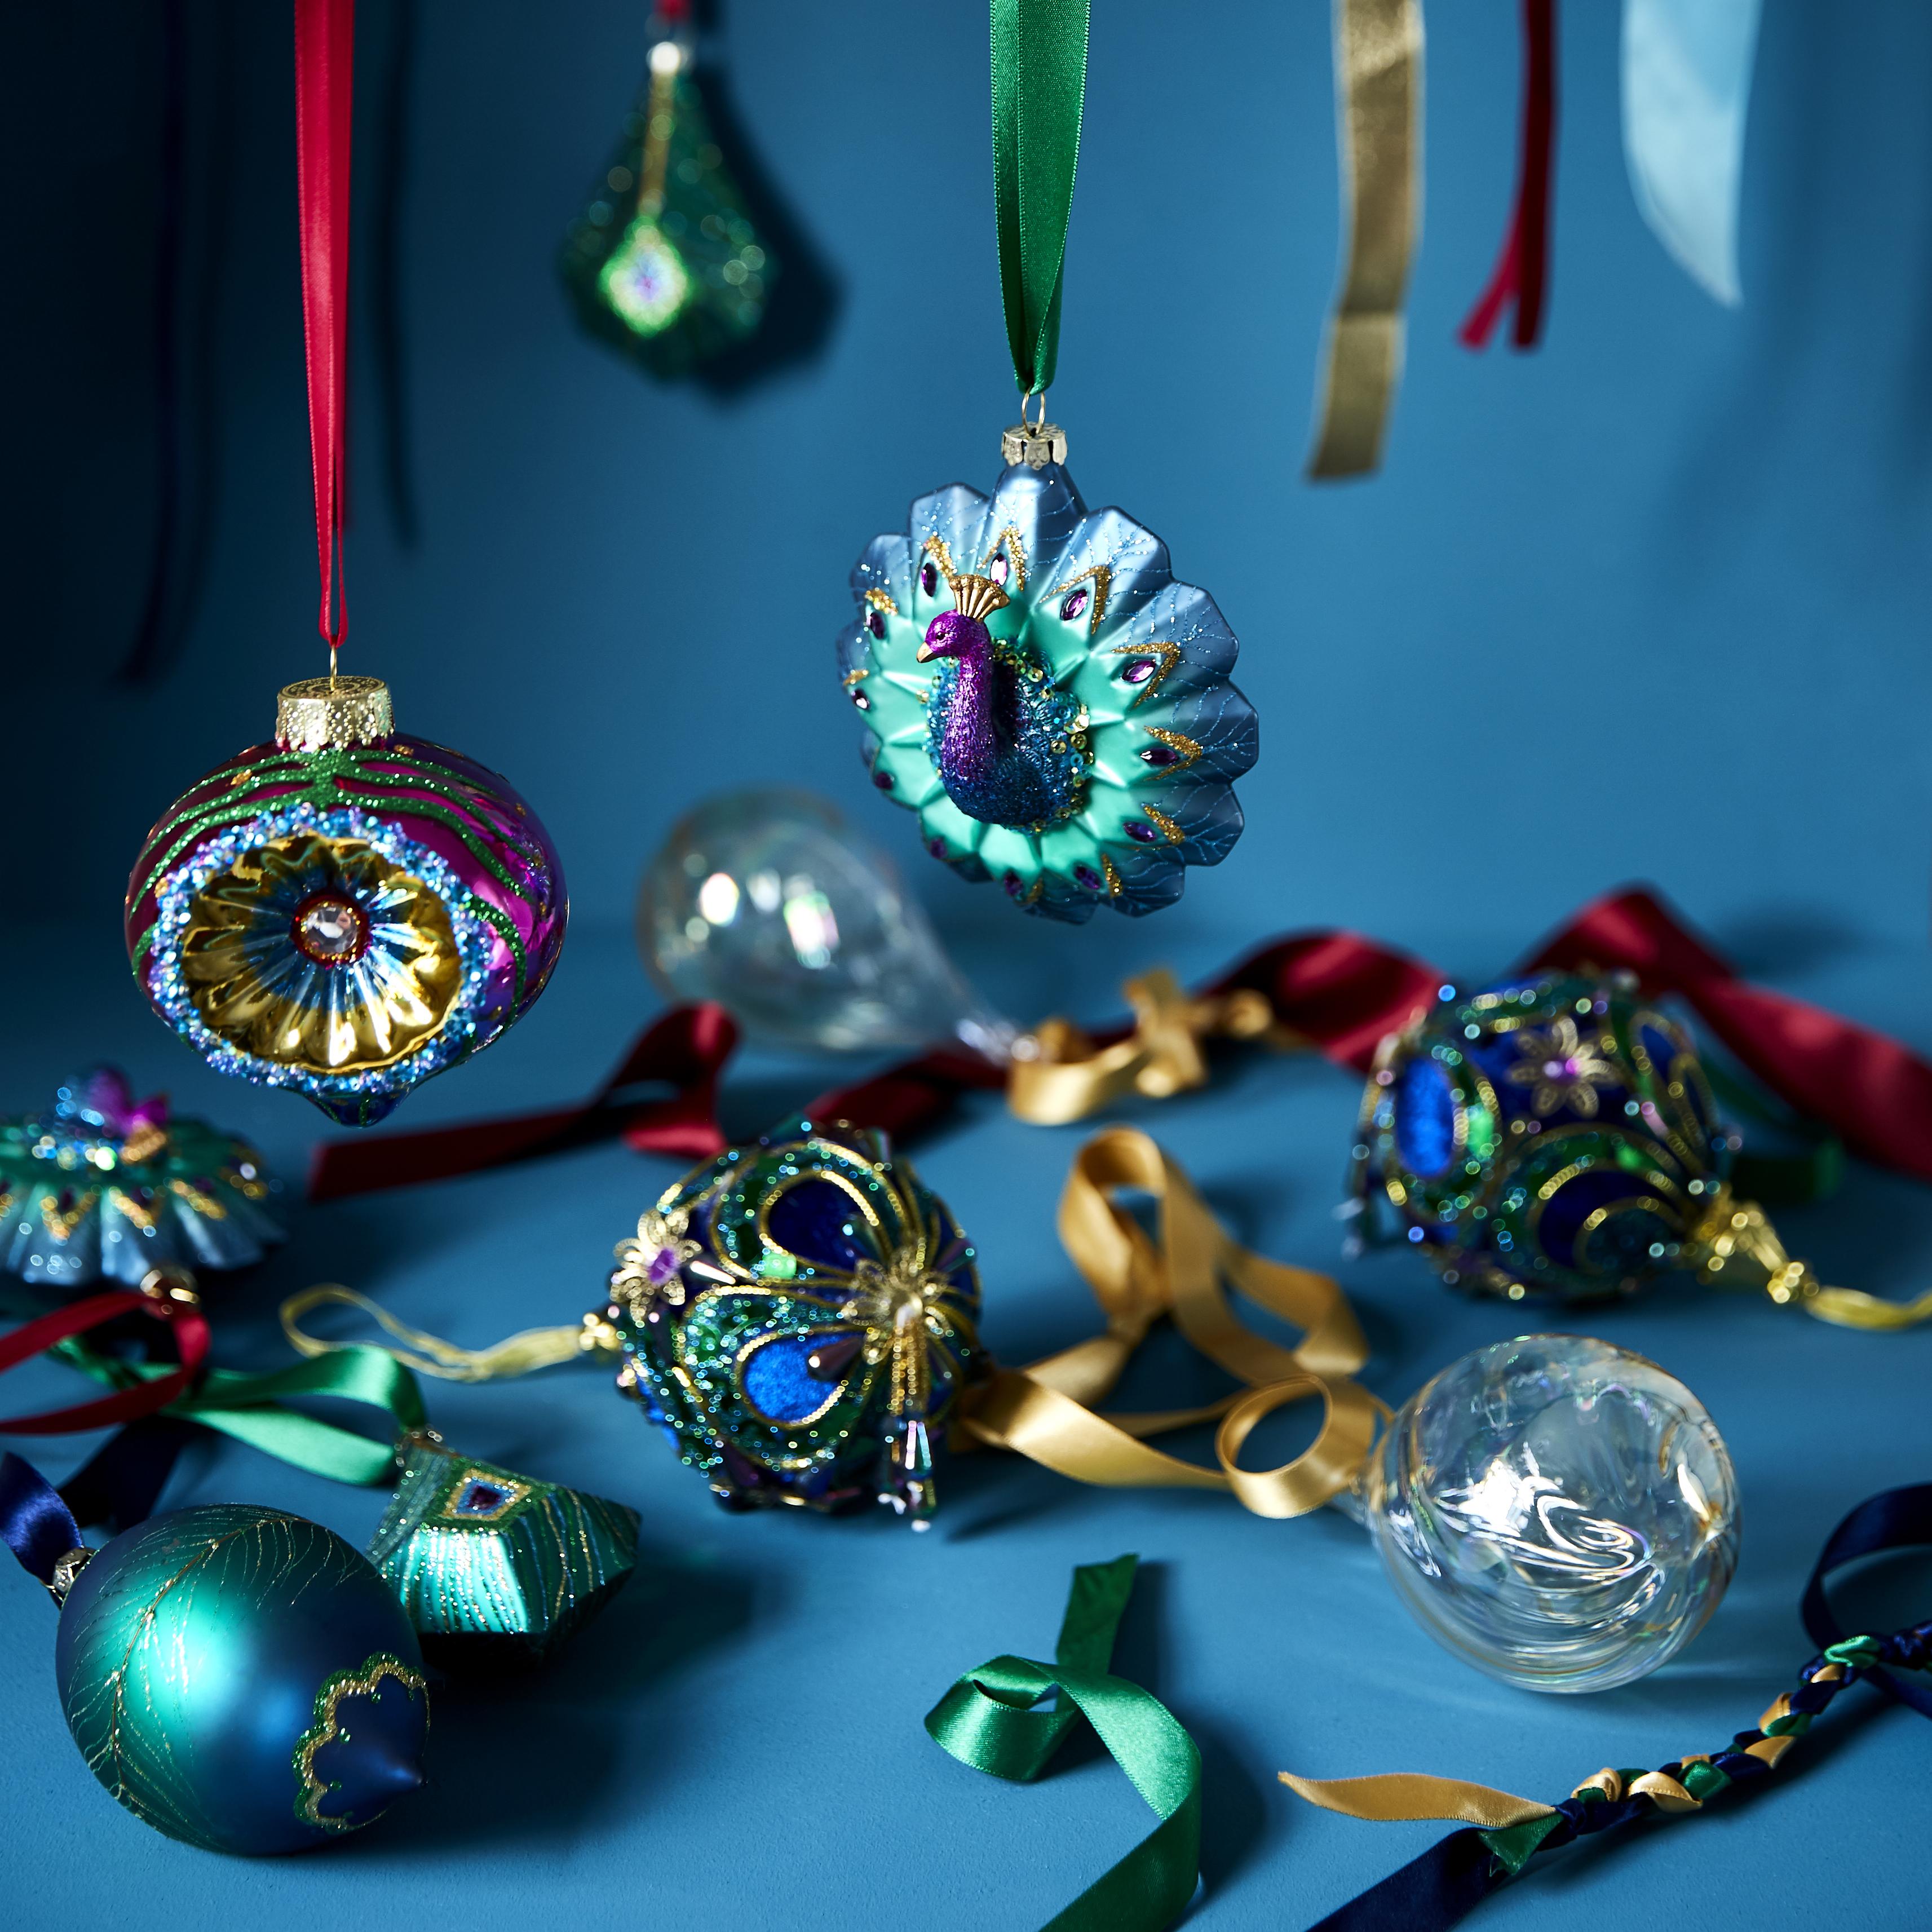 Laura Ashleigh - Christmas Candels8047_RT_HR